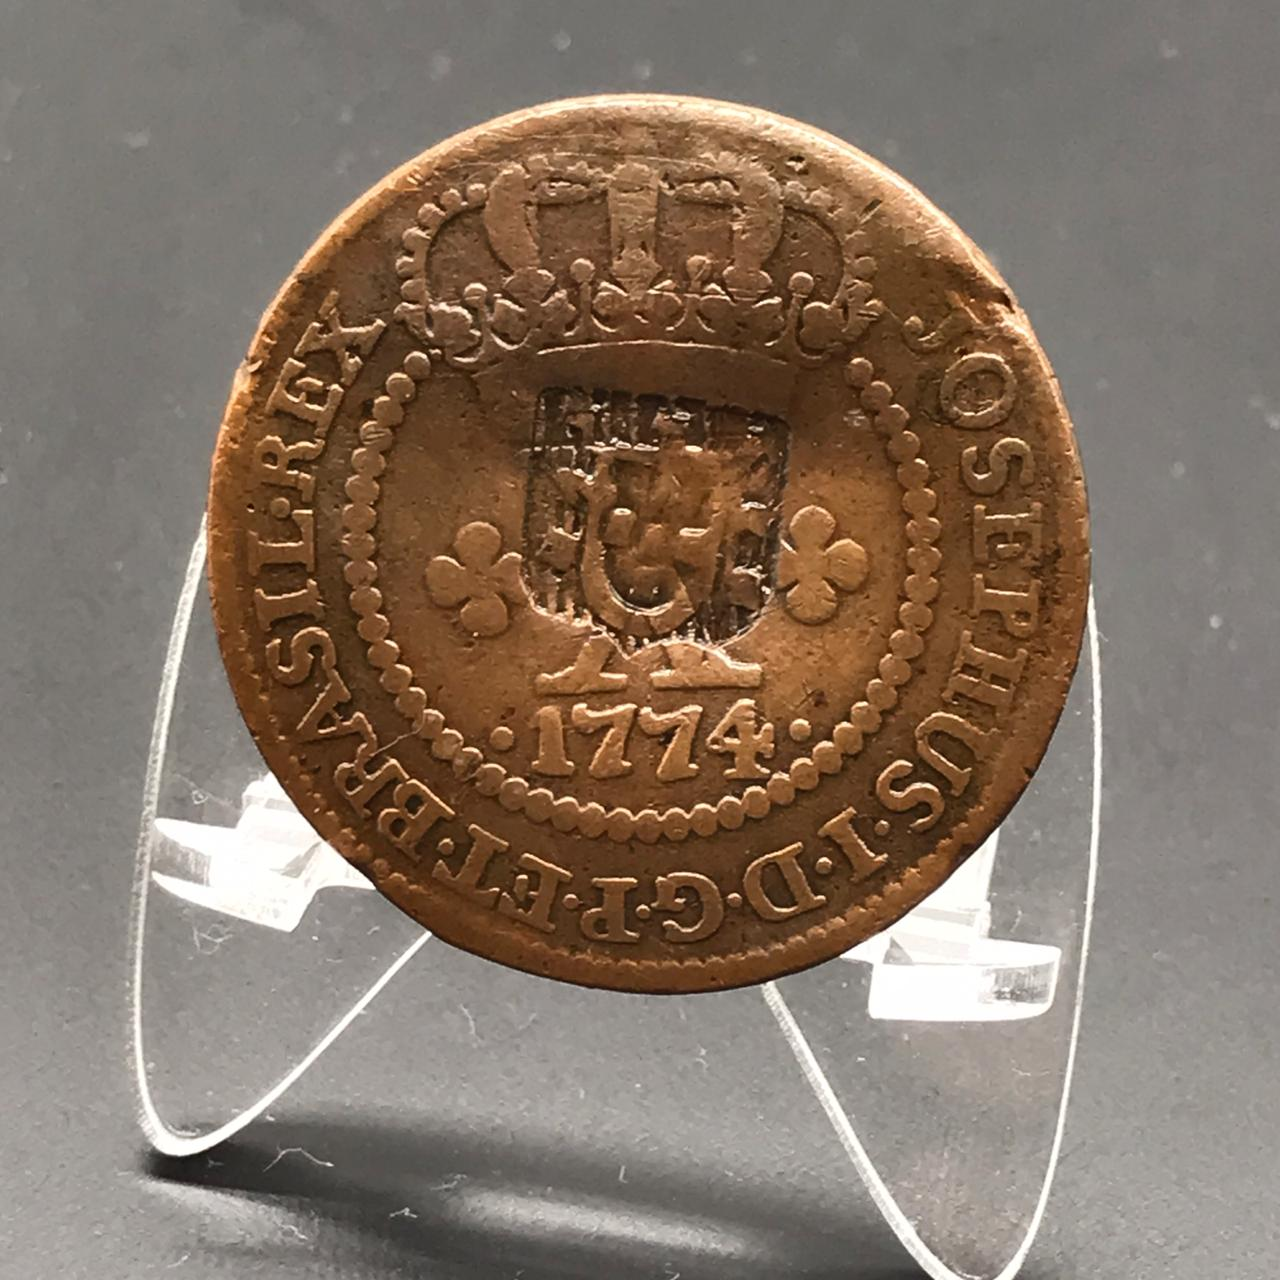 X RÉIS 1774 16 PÉROLAS  CARIMBO ESCUDETE